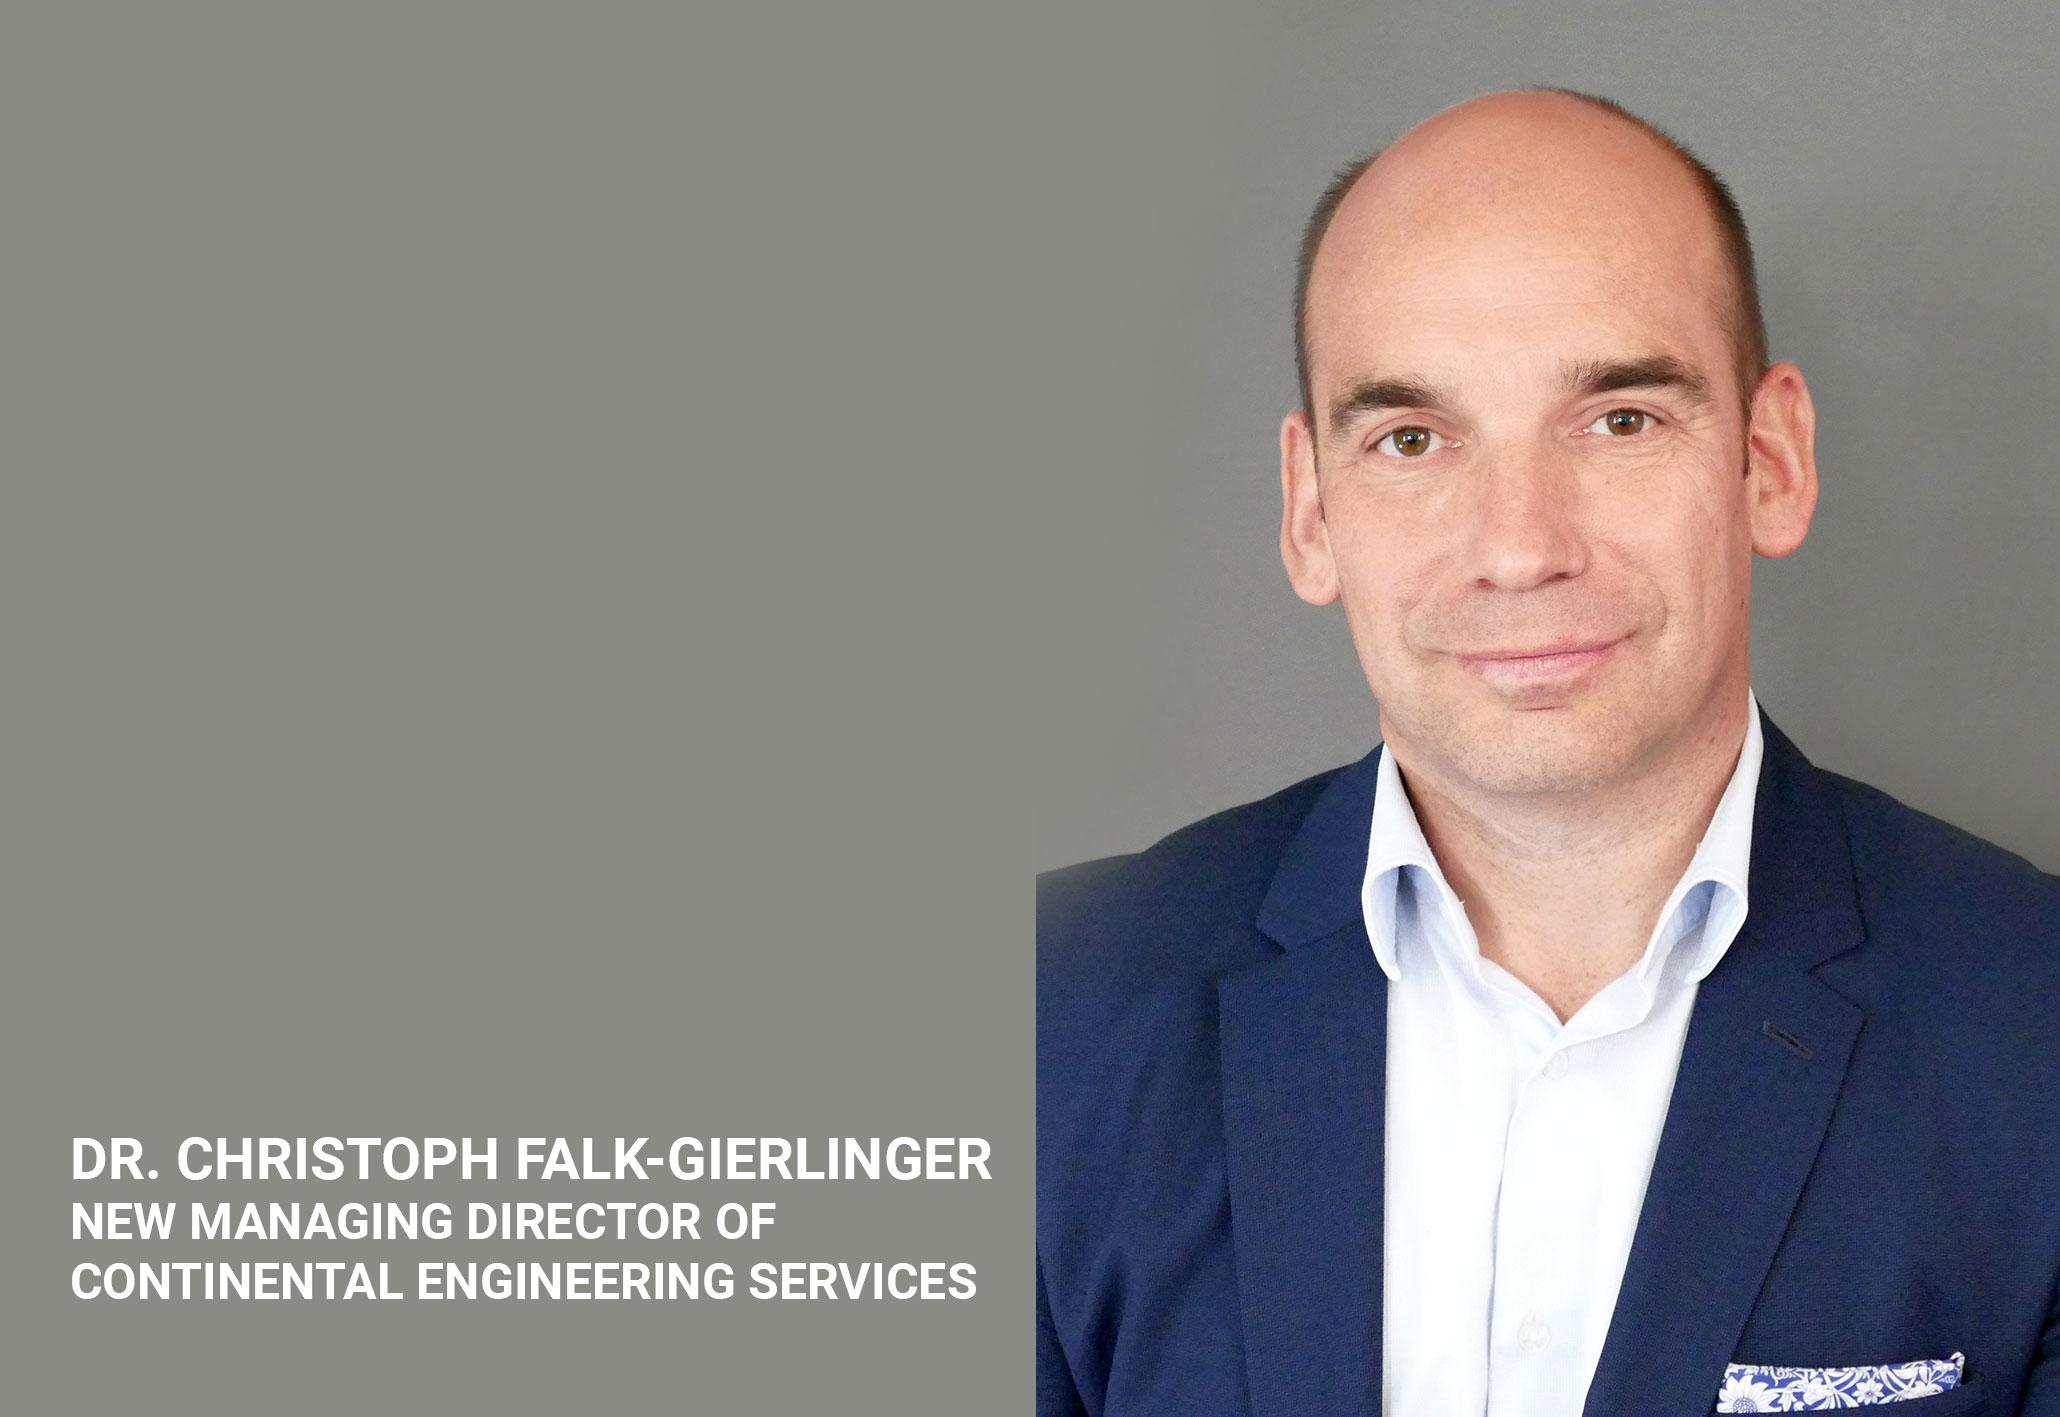 Dr. Christoph Falk-Gierlinger Named New Managing Director of Continental Engineering Services